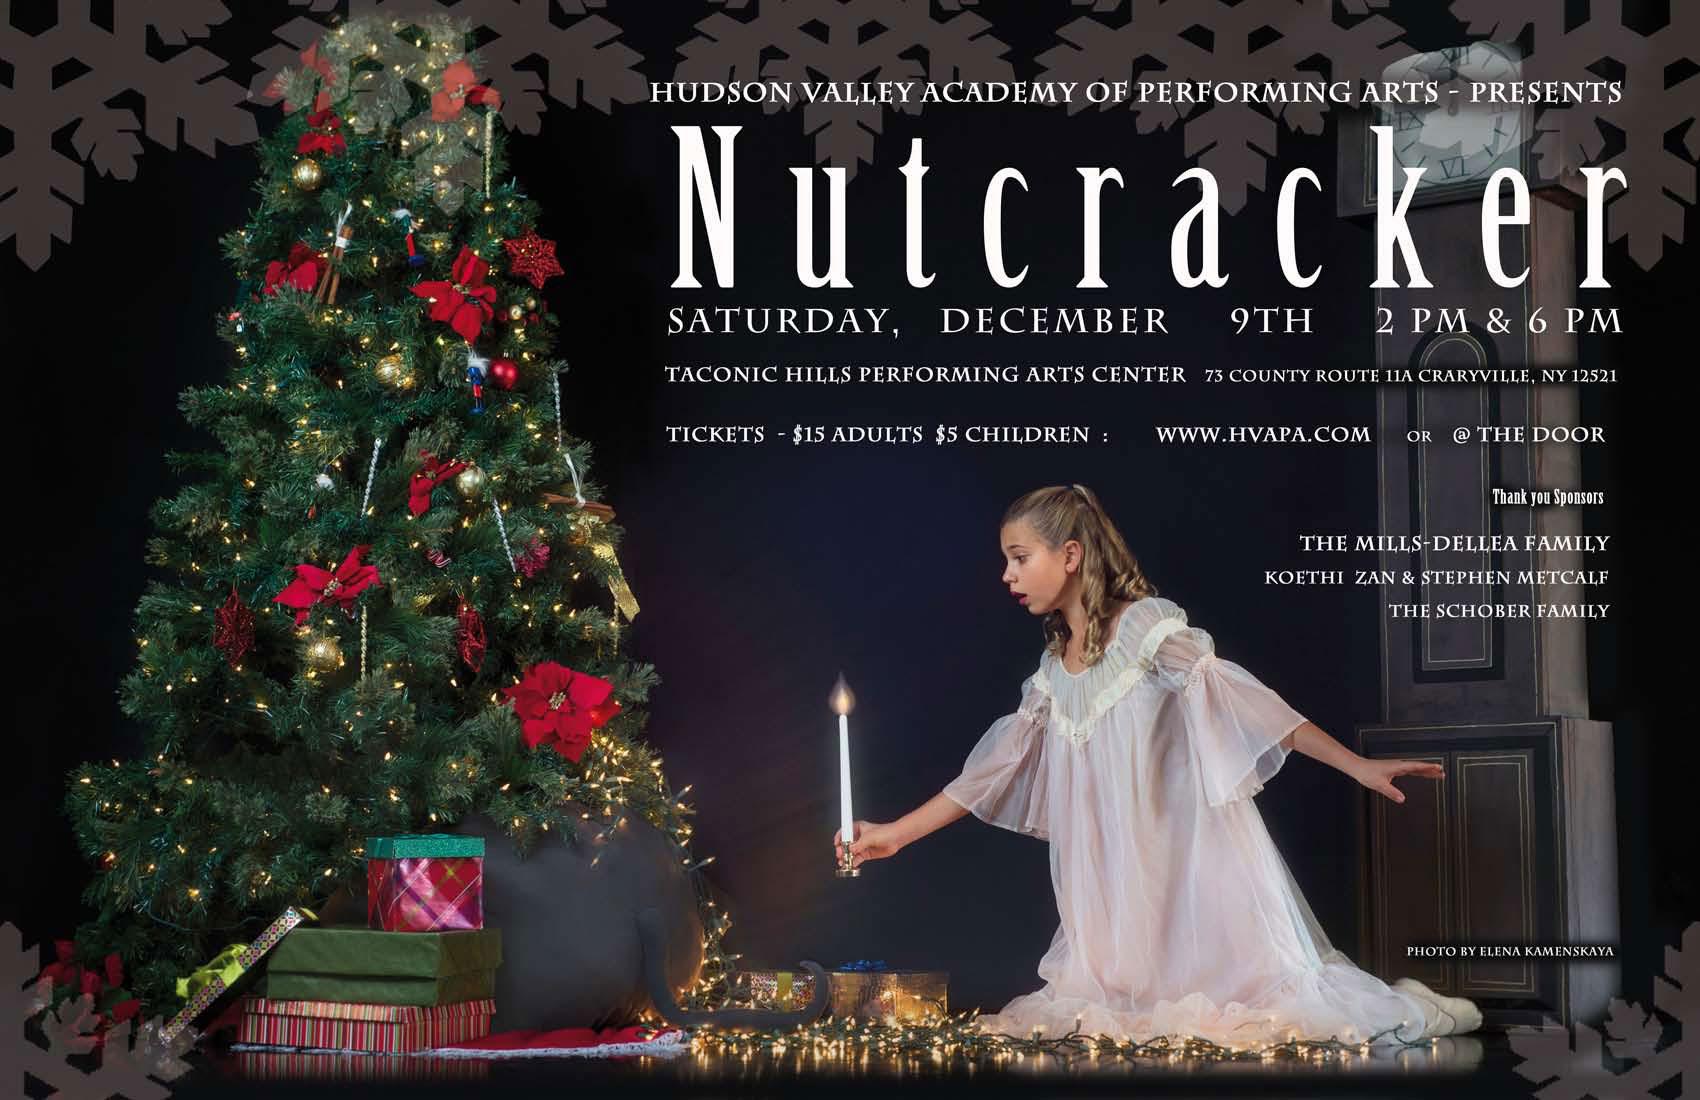 Hudson Valley Academy of Performing Arts - 2017 Nutcracker